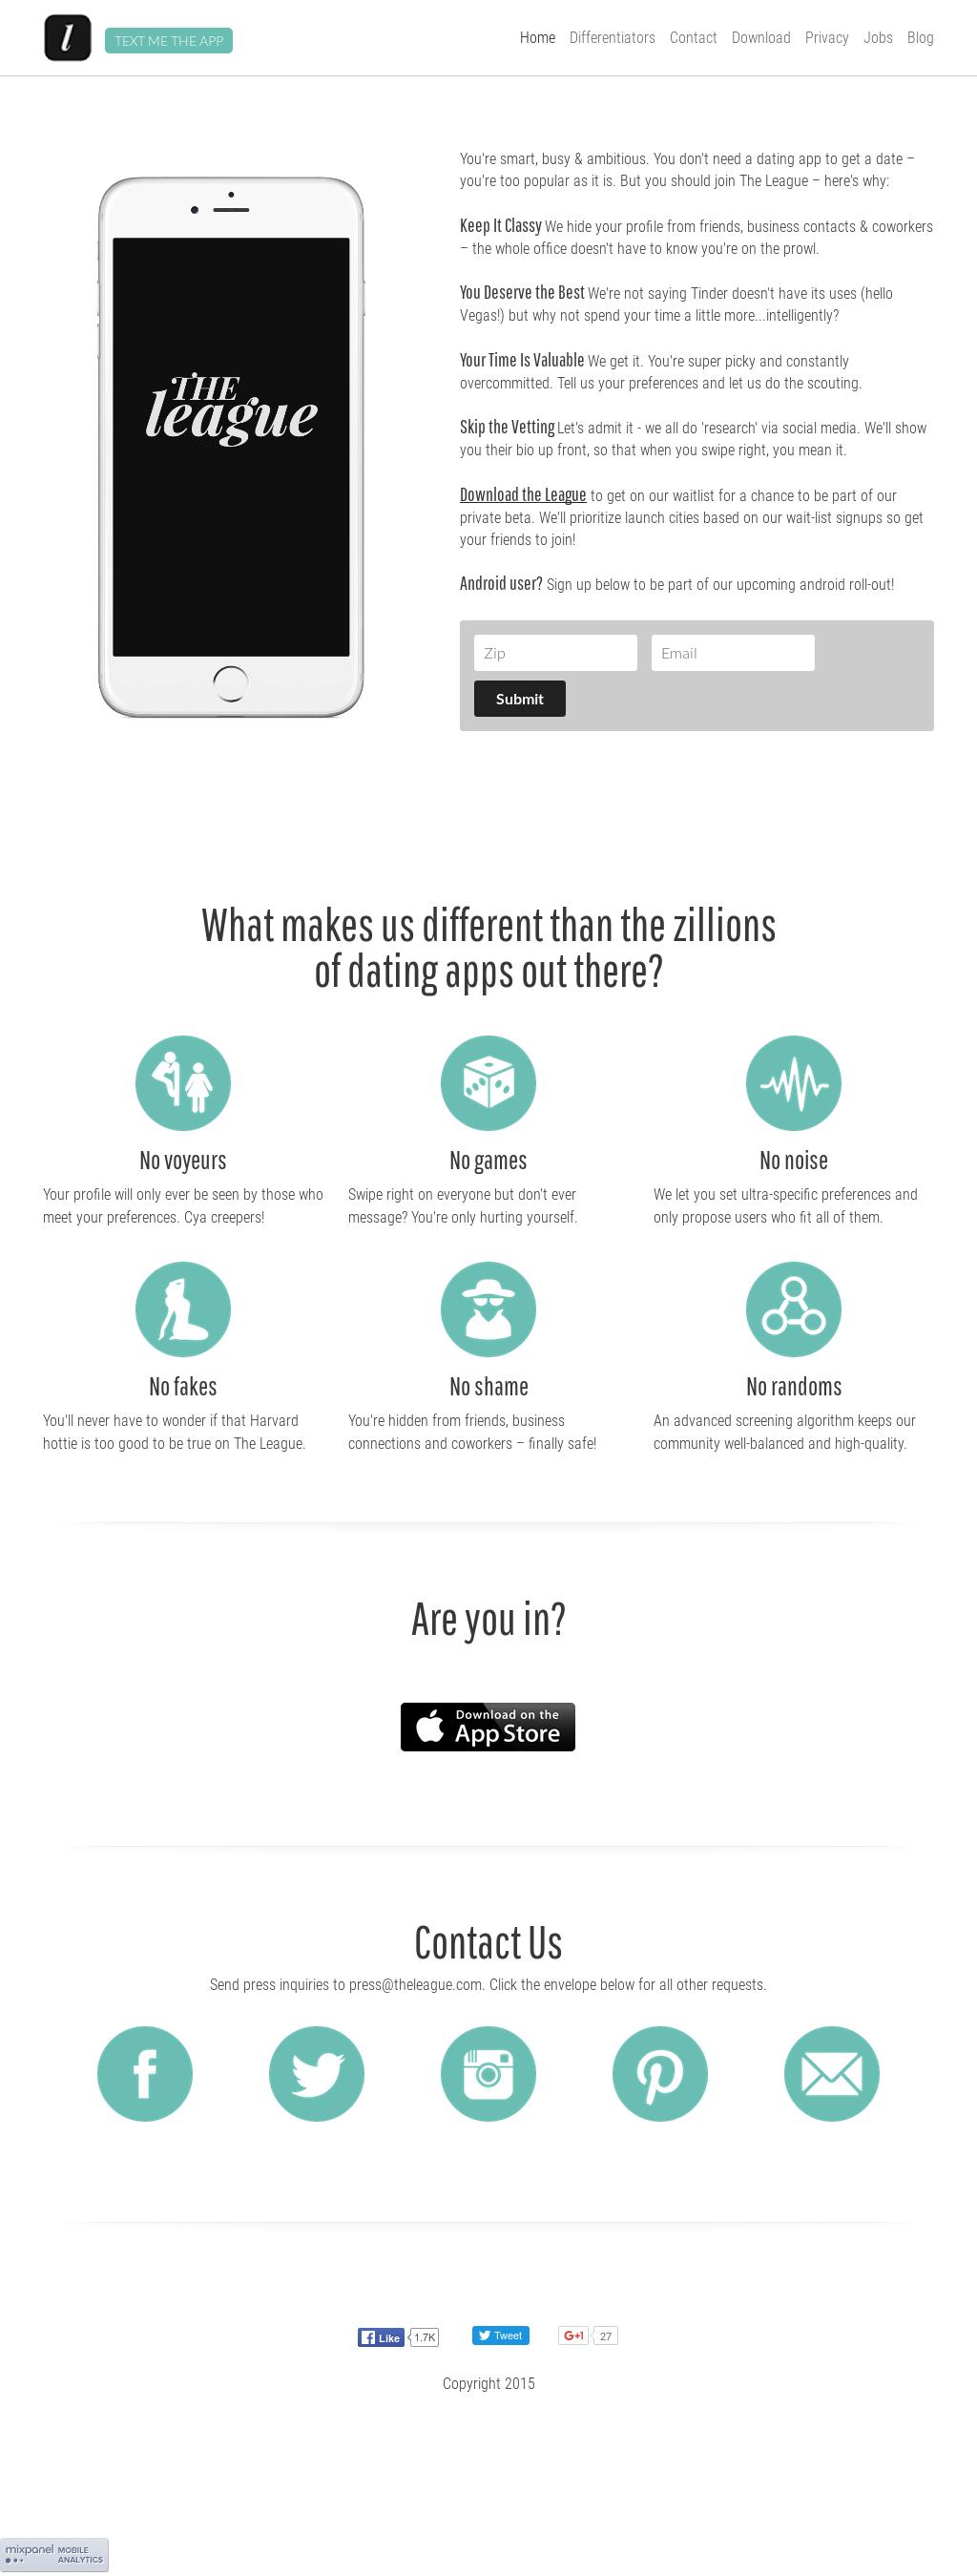 the league dating app waitlist